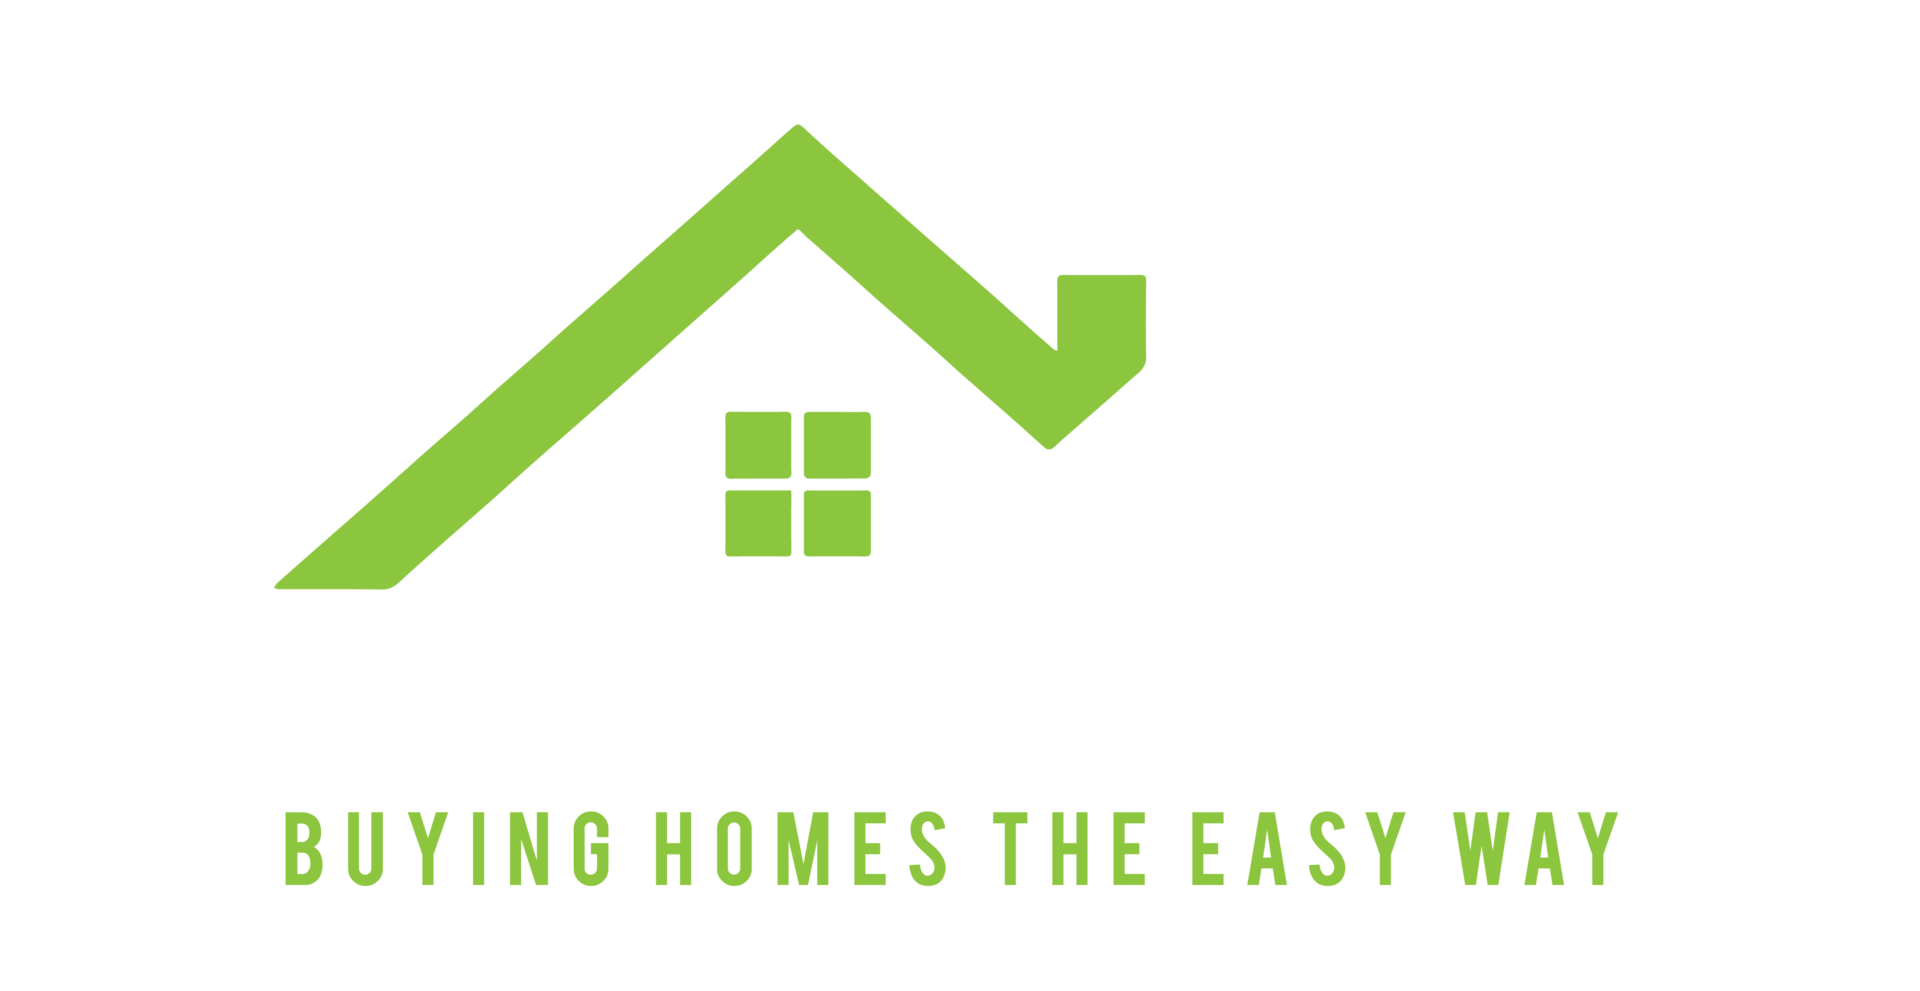 Sell My House Fast NJ [We Buy Houses NJ] Cash Home Buyers In NJ logo